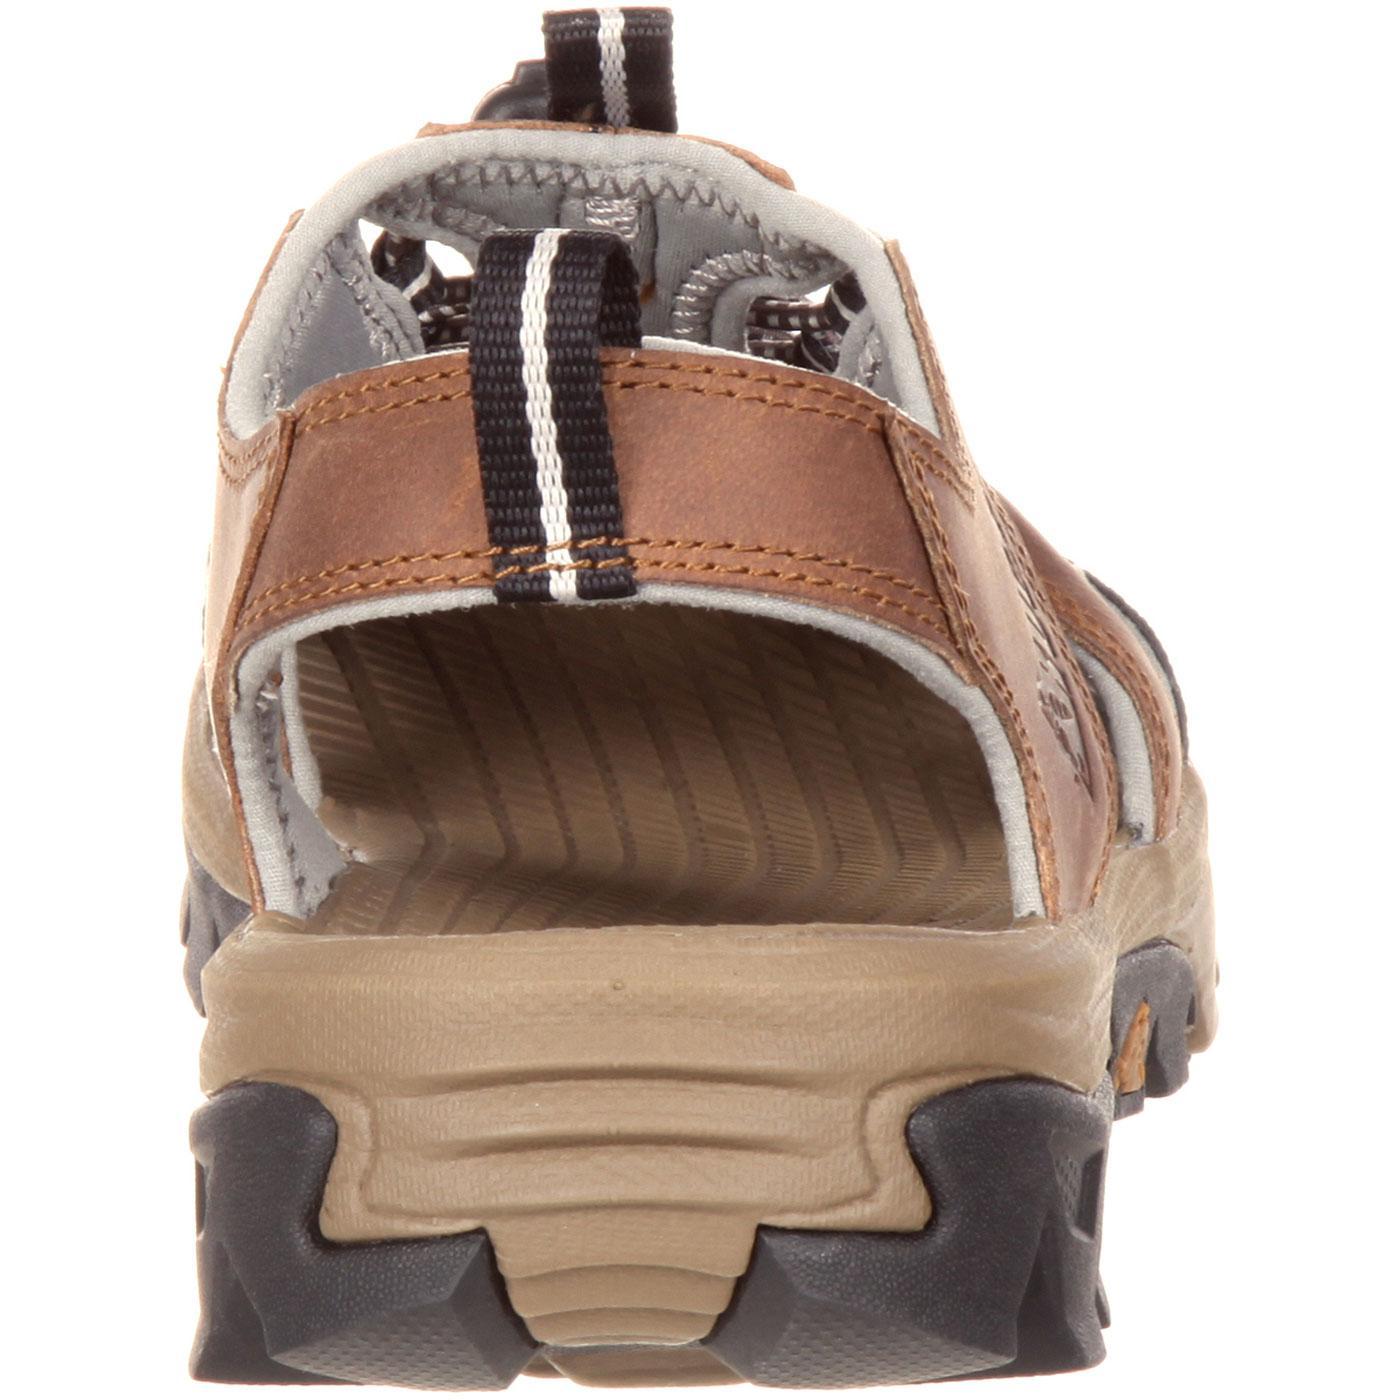 9a7a598e6016 Images. Rocky Endeavor Point Women s Hiking Sandal ...